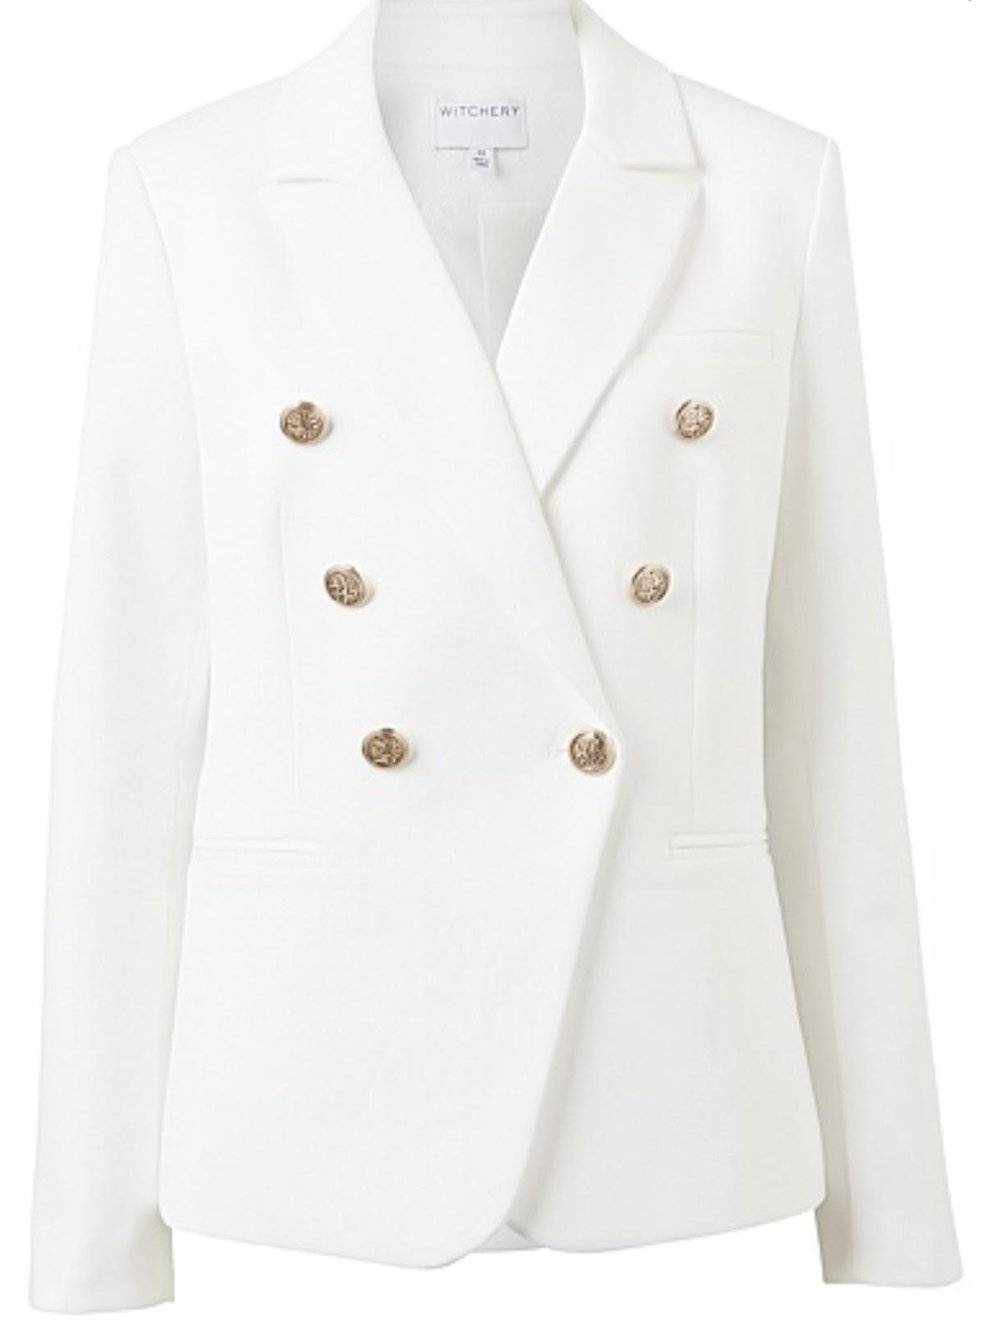 LESS Blazer - Witchery Double Breasted Blazer in MILK WHITE$279.952/778-782 Military Rd, Mosman(02) 9968 1647